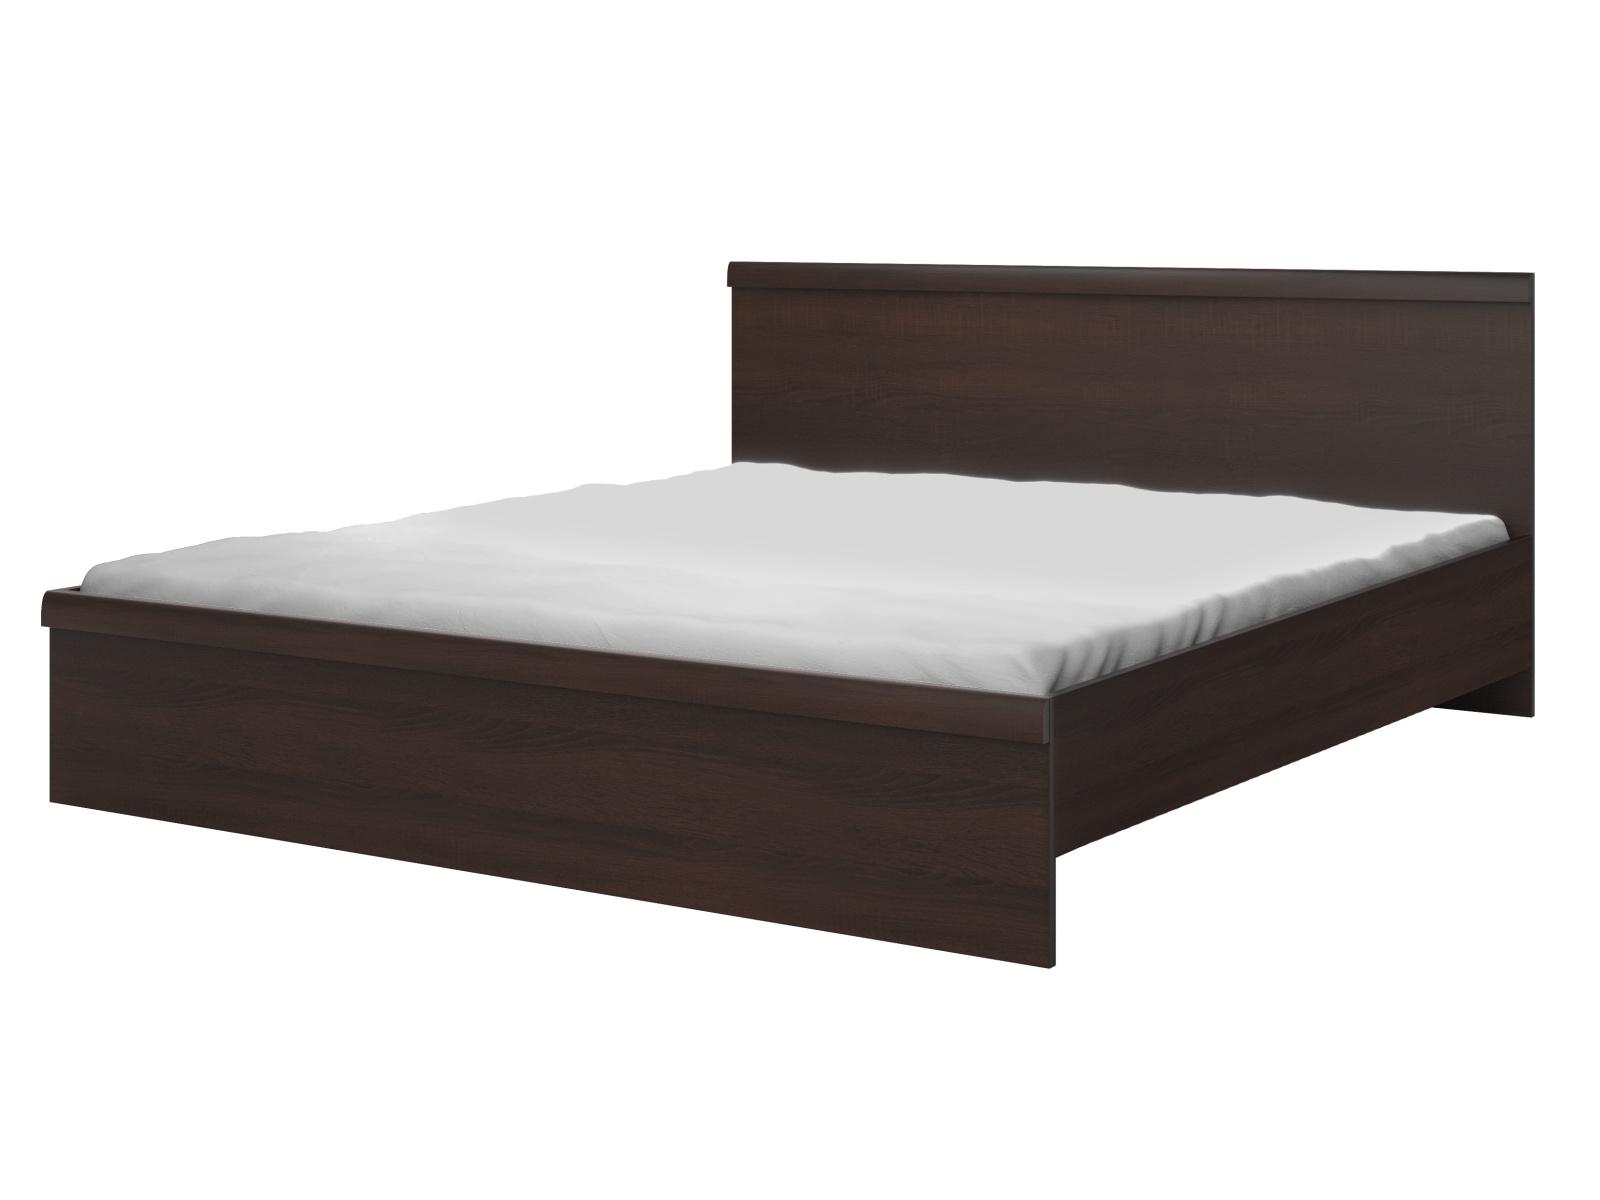 Smartshop MESTRE postel 160x200 cm TYP 31, dub sonoma tmavý